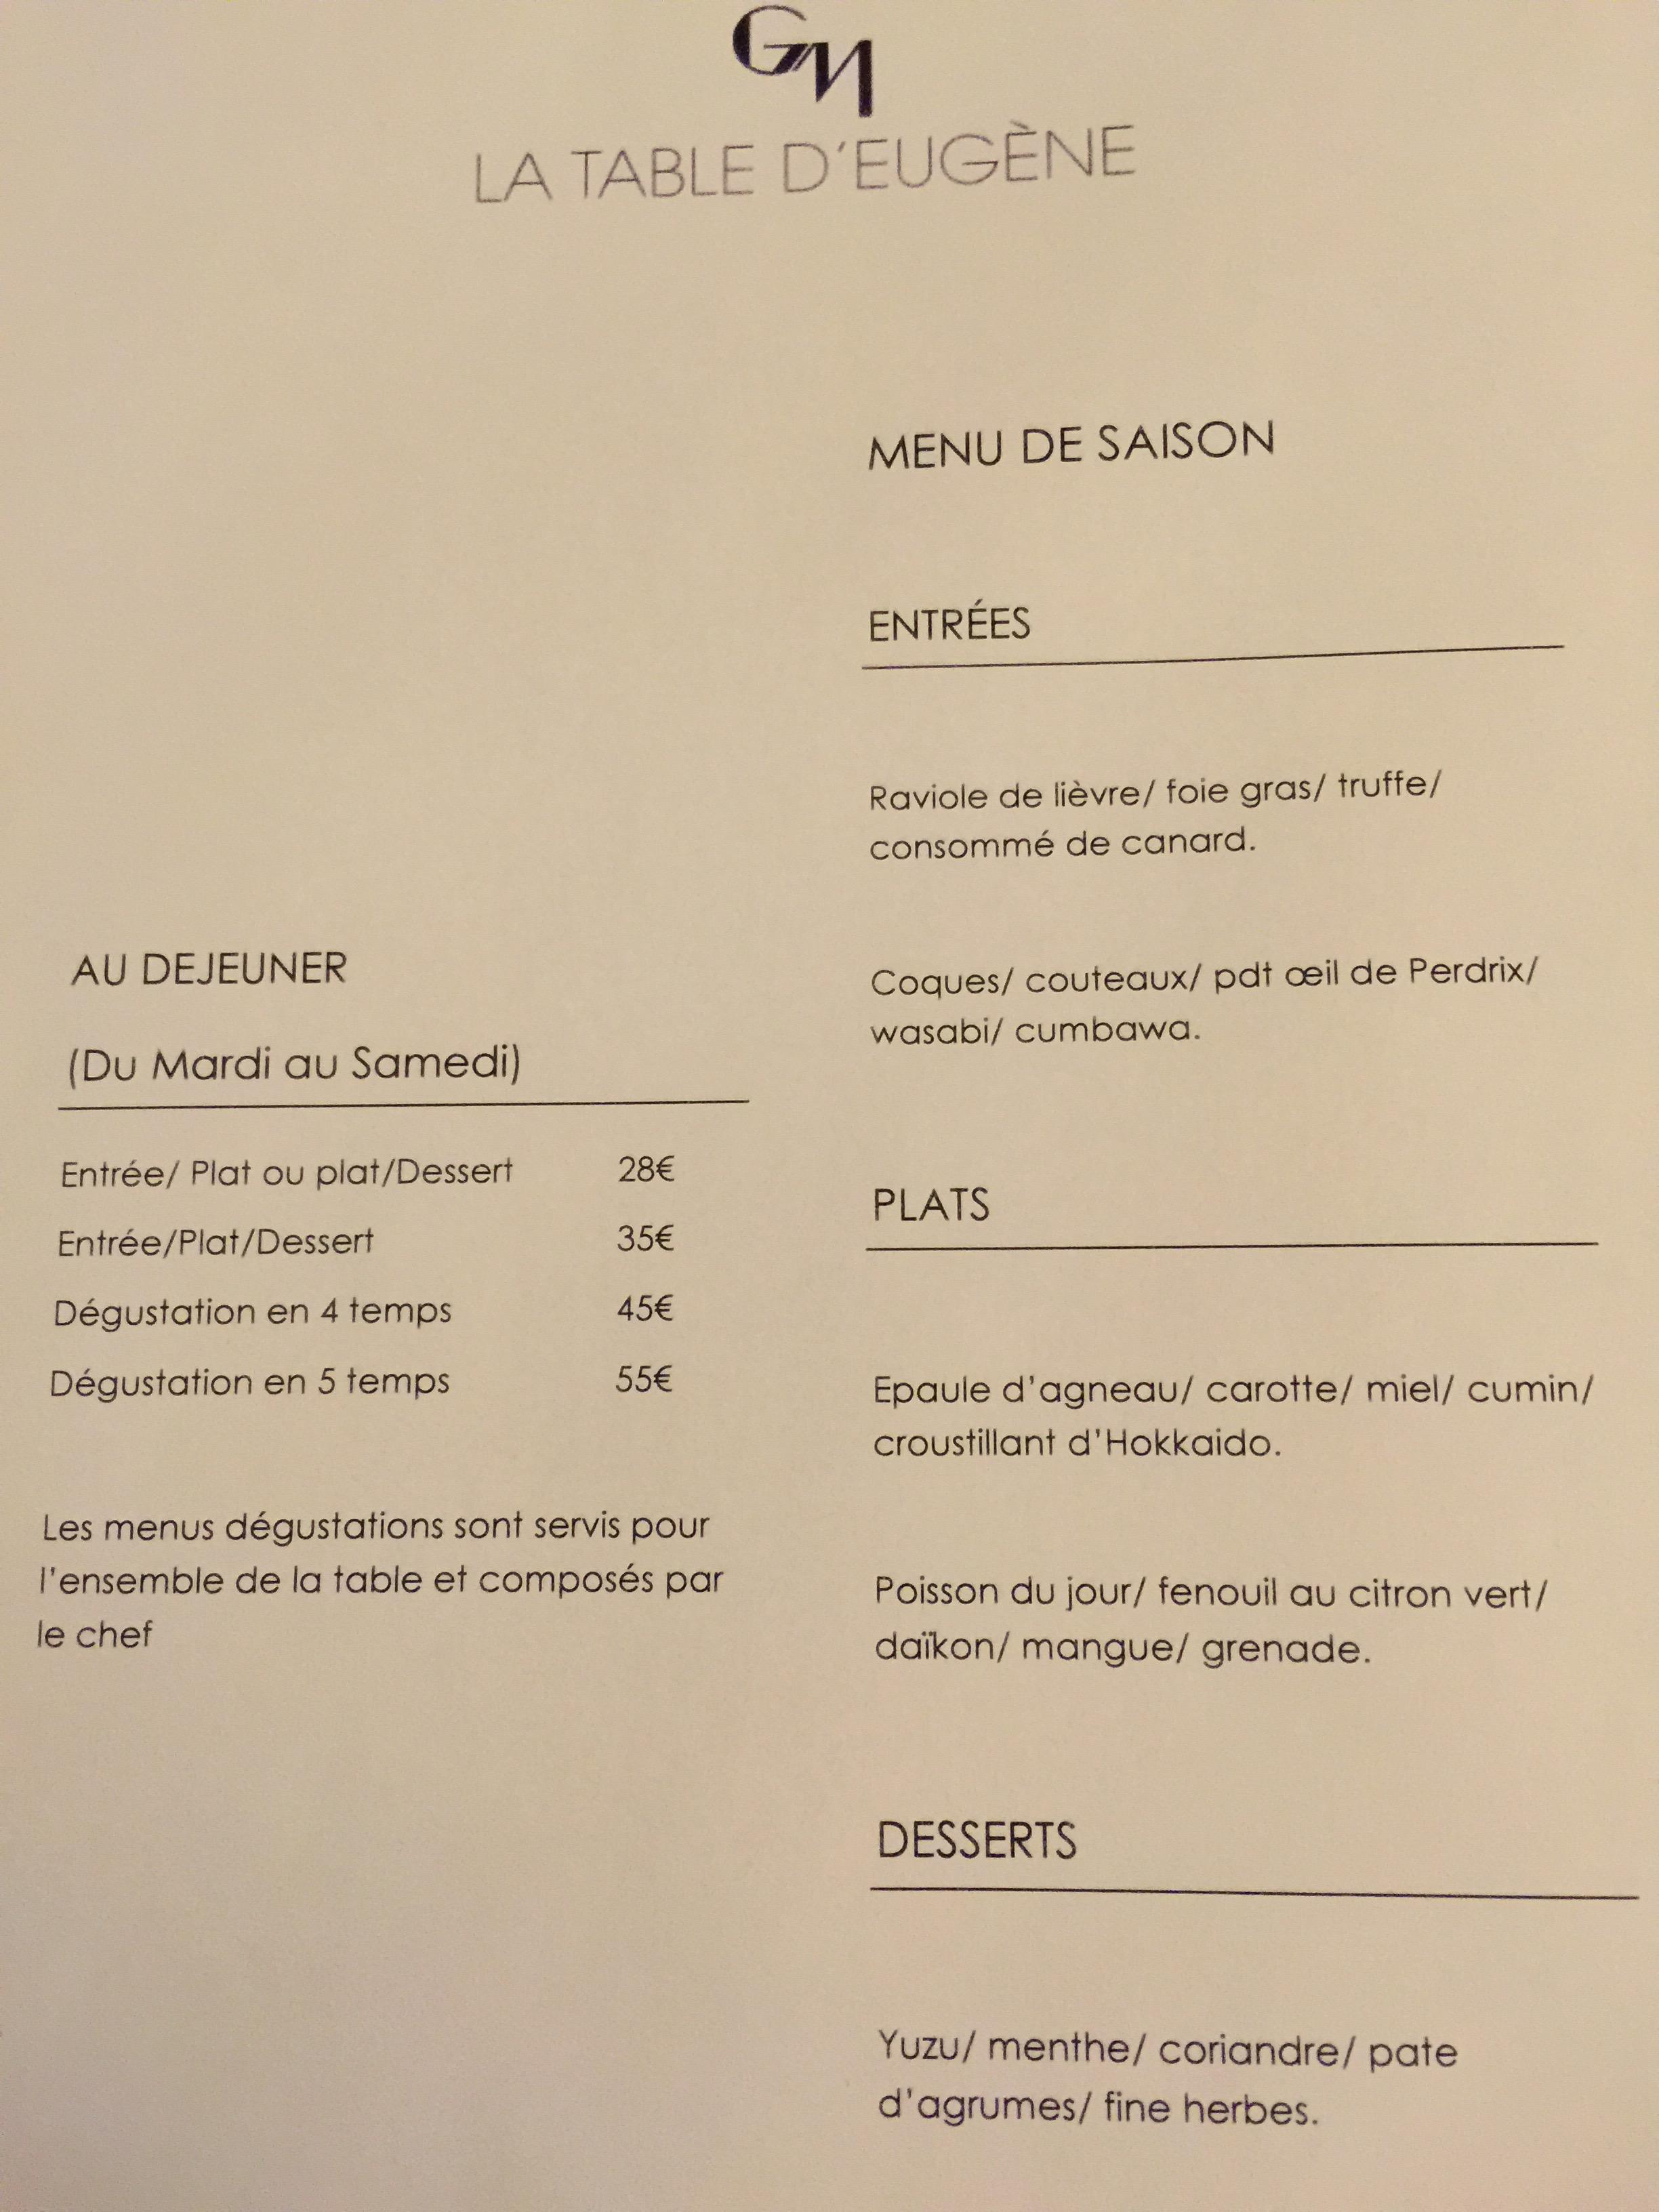 La Table D Eugene Paris 2 7 15 Dining With Frankie